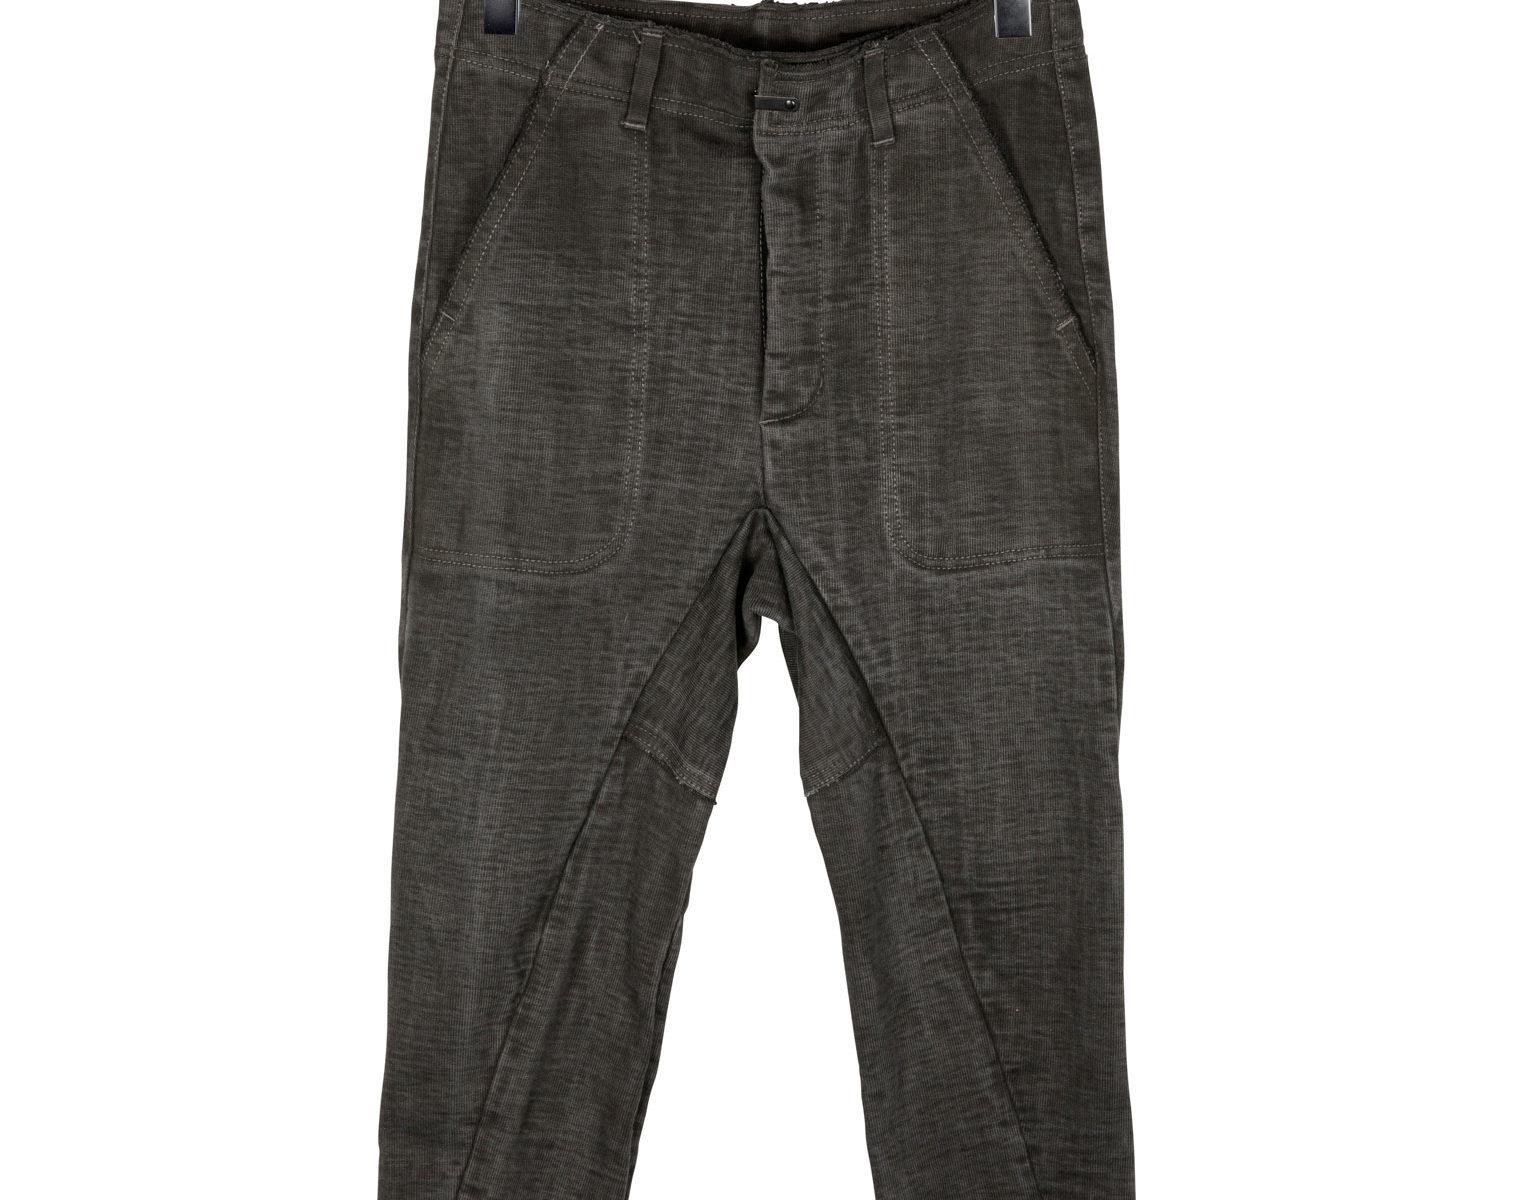 THE VIRIDI-ANNE Slim Cotton Pant 1